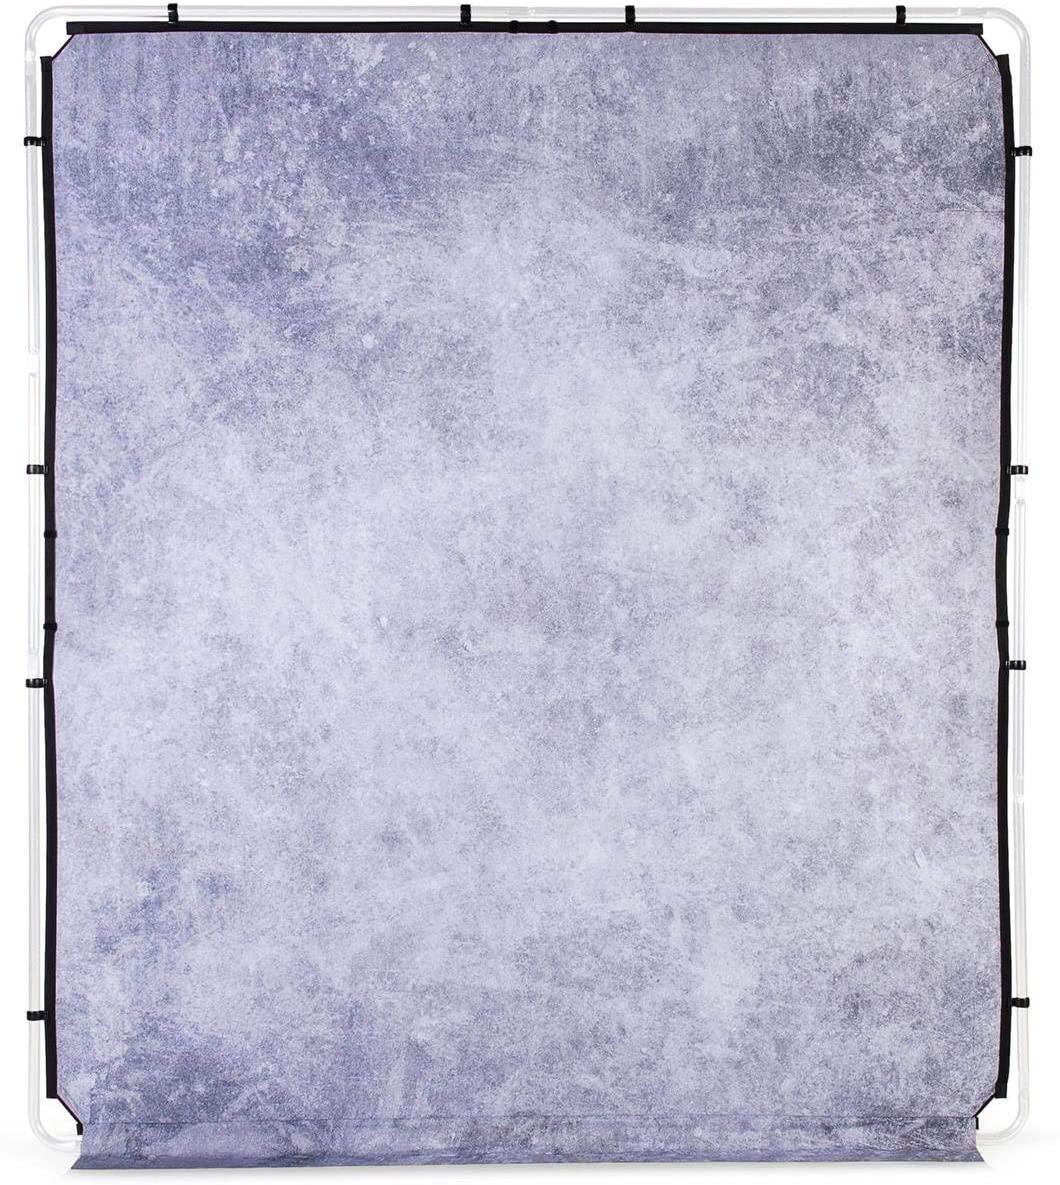 Lastolite EzyFrame Vintage Backround Cover, 6.5x7.5', Concrete